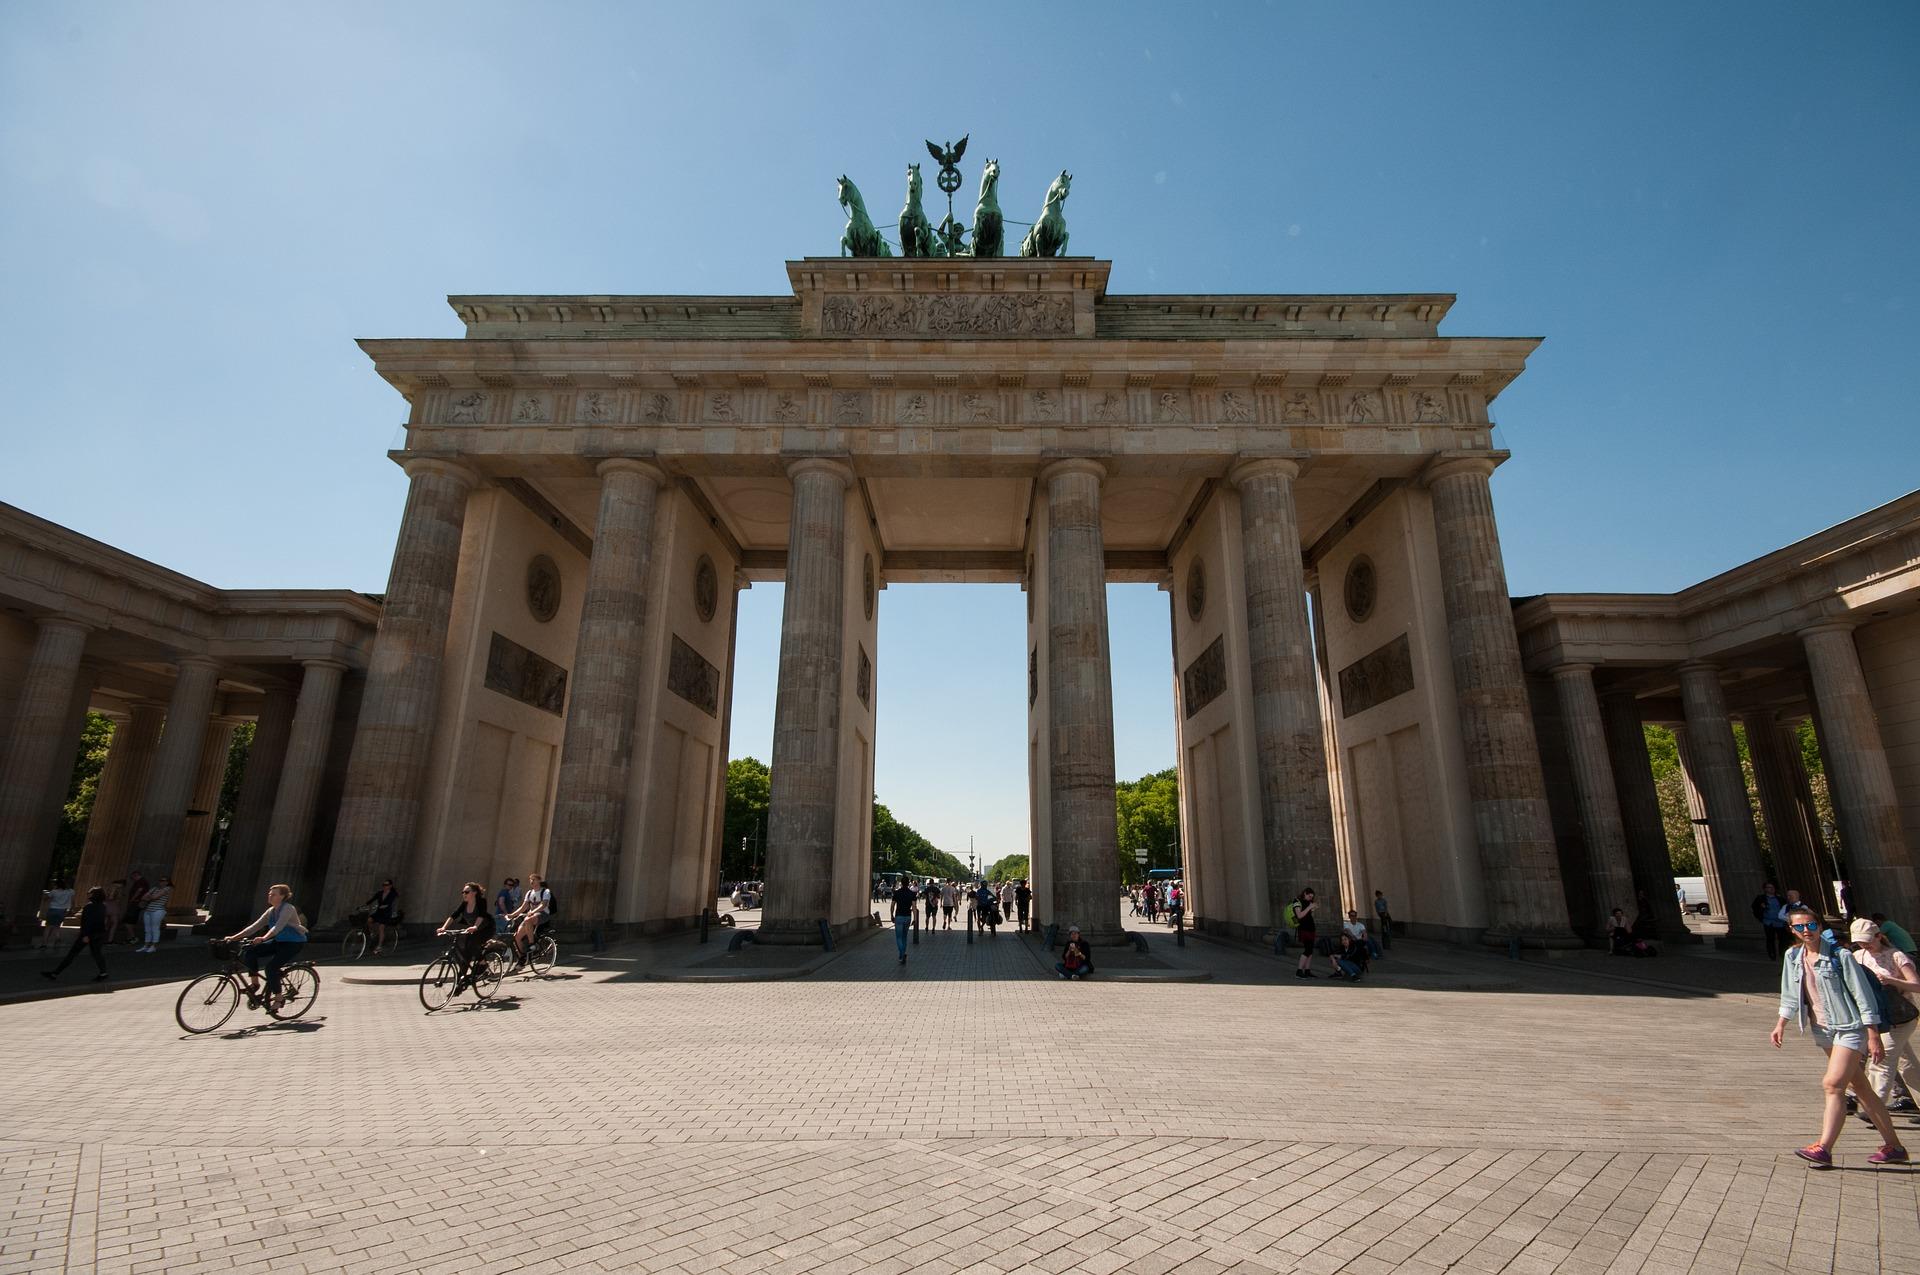 Historic Berliner Mauer, Germany